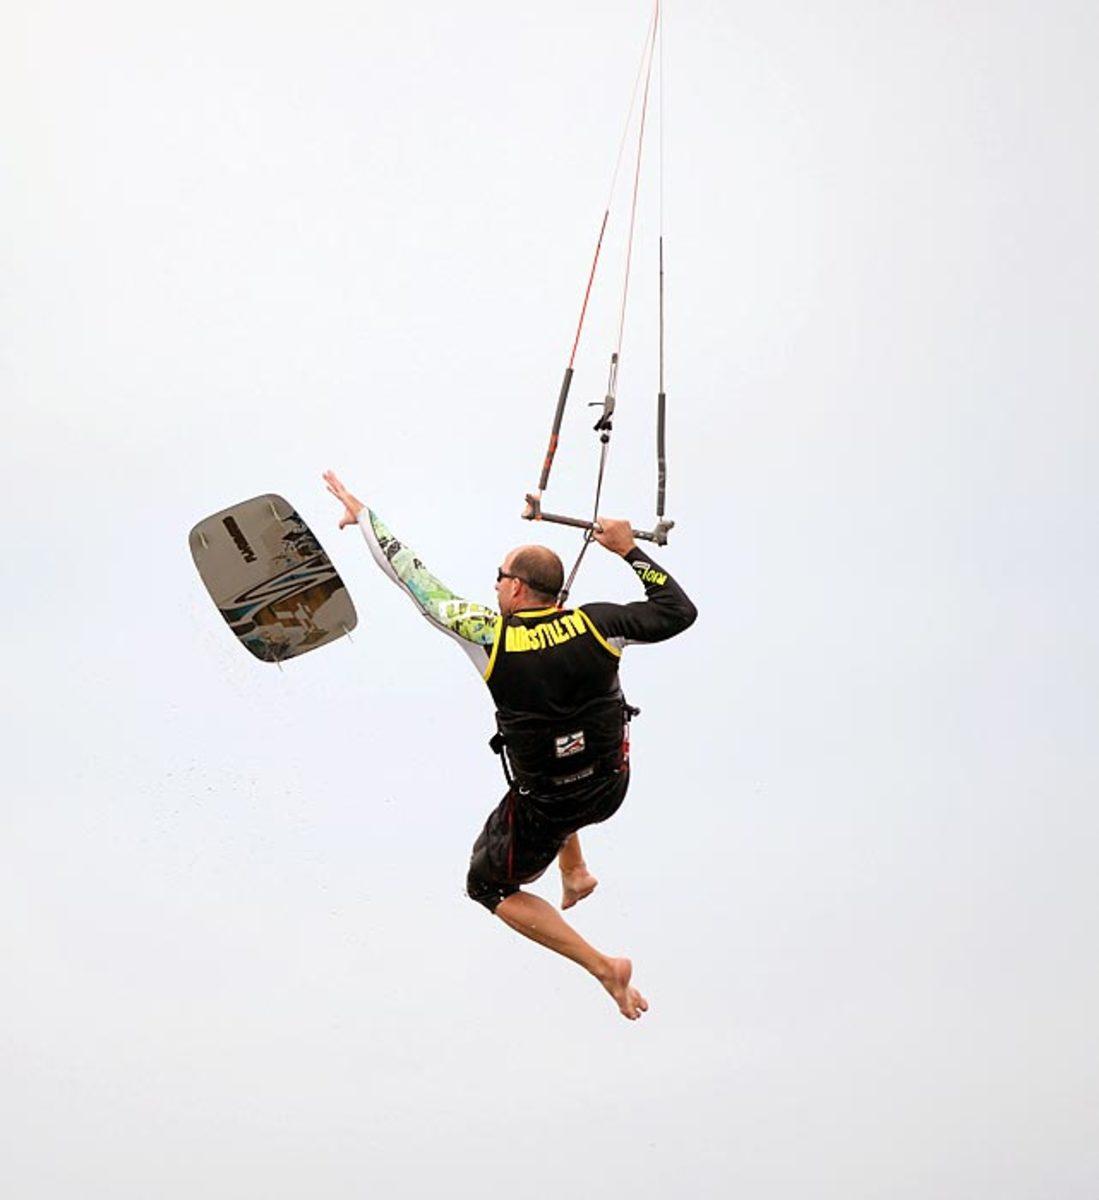 130725112138-kite-surfing-8-single-image-cut.jpg